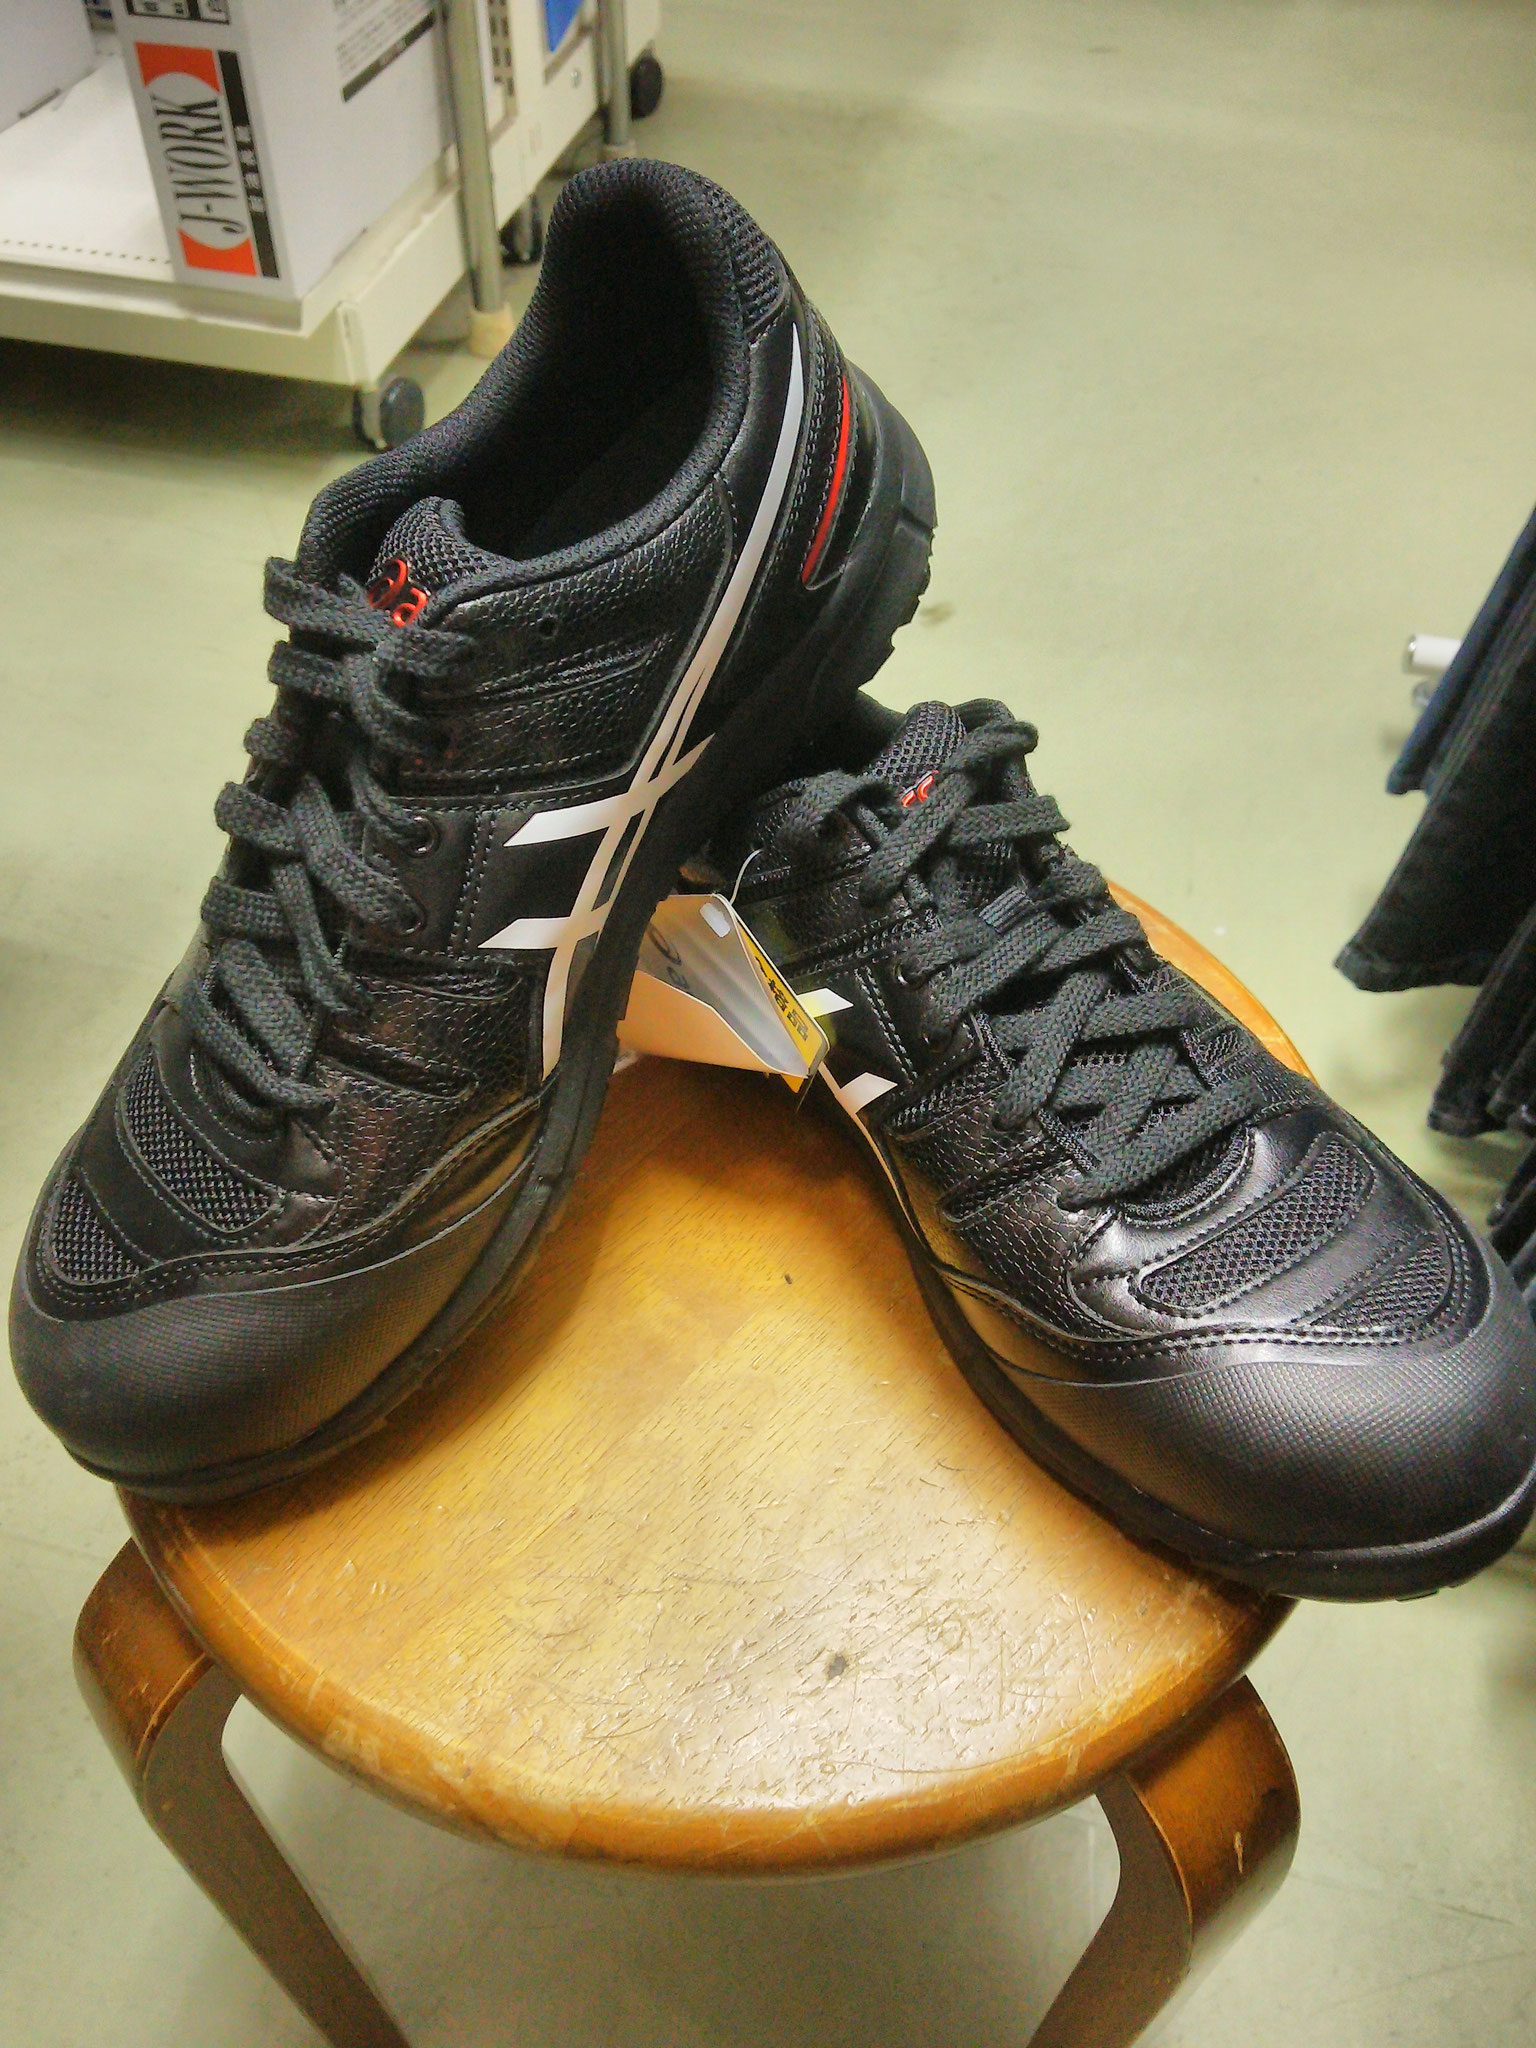 CP103 アシックス安全スニーカー ブラック  ¥9,900(税込)